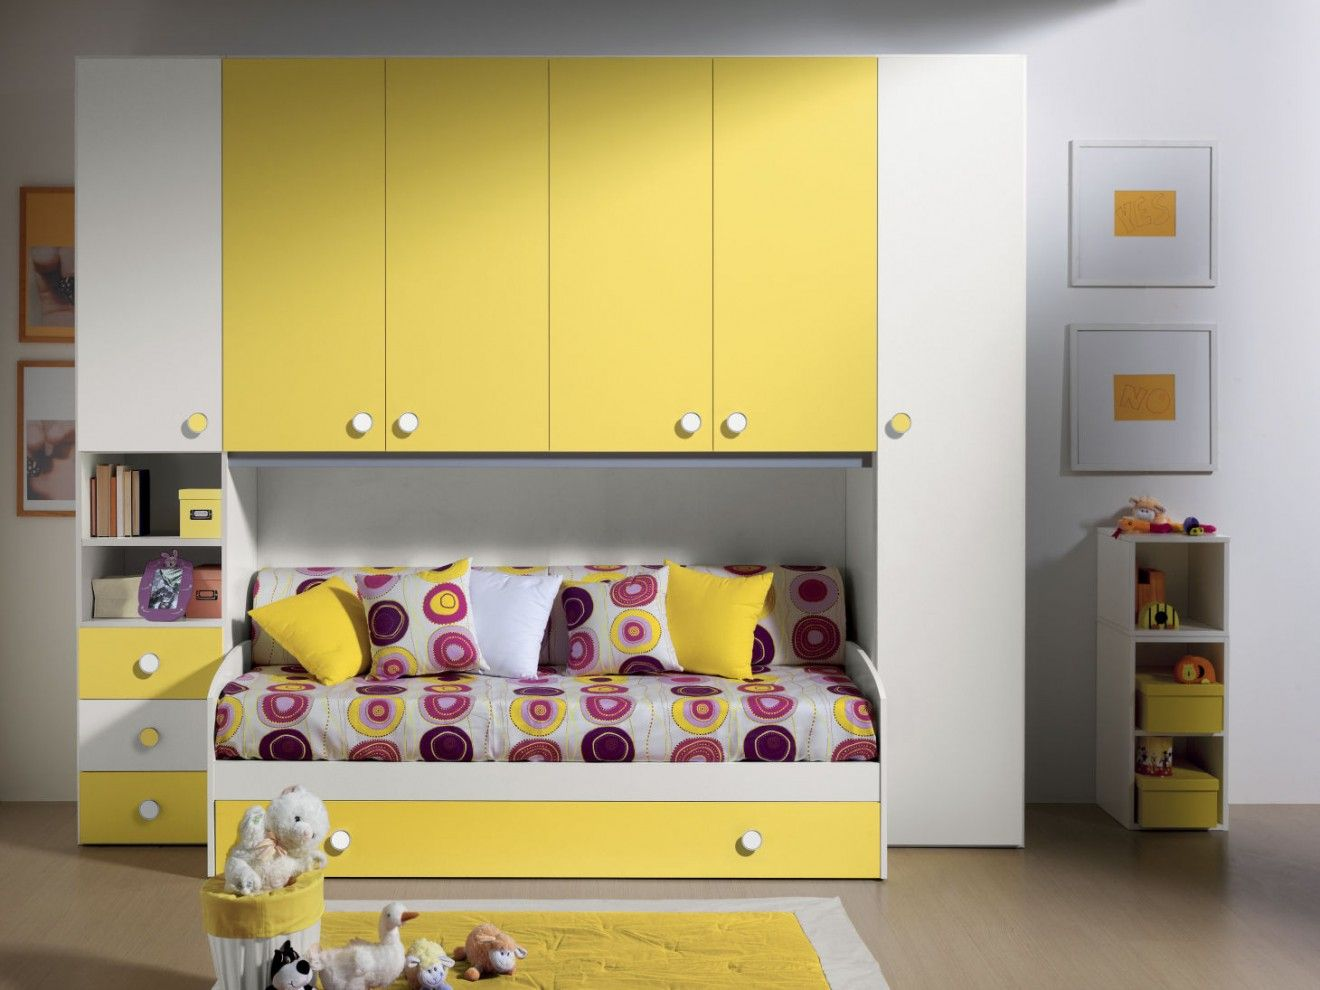 Cameretta a ponte samuel camerette furnishing bedrooms for Design delle camere dei bambini